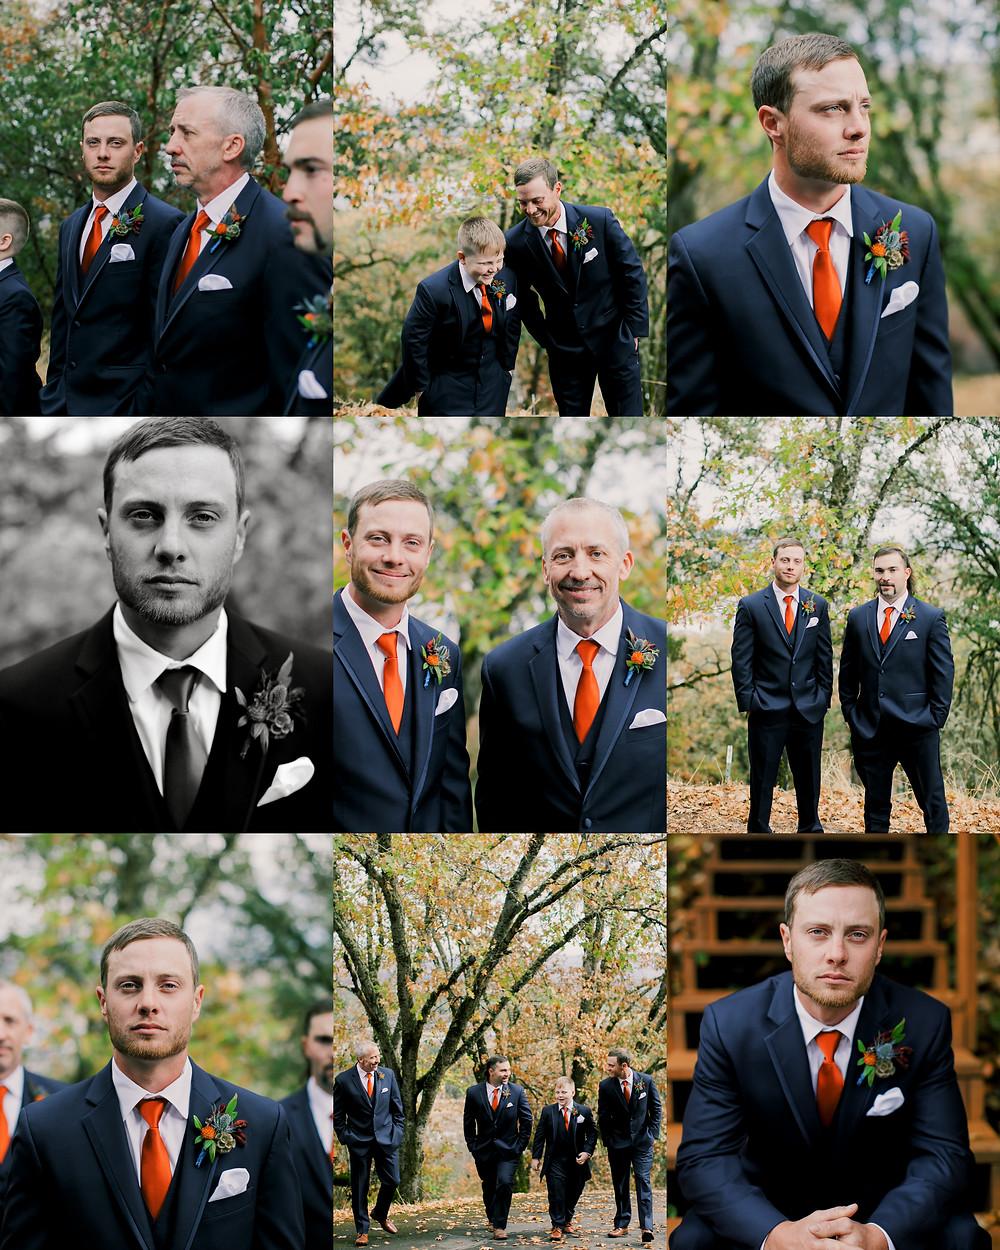 Groom in Medford oregon wedding